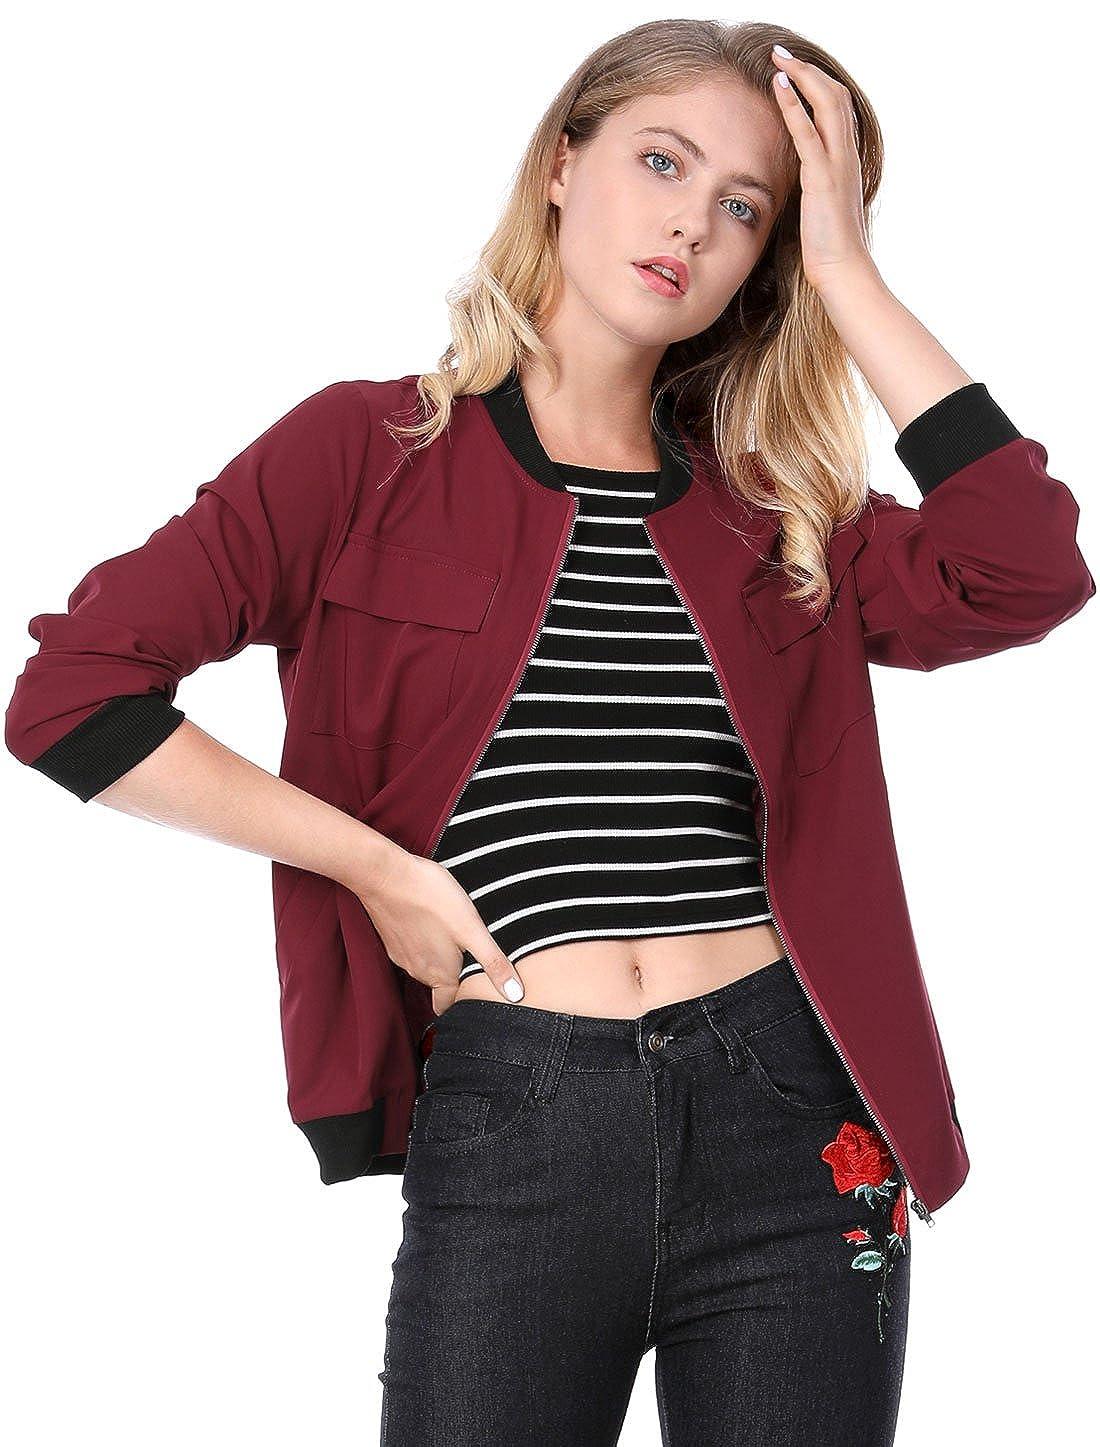 Allegra K Women's Zip Up Pocket Lightweight Classic Bomber Jacket g16061500ux0033